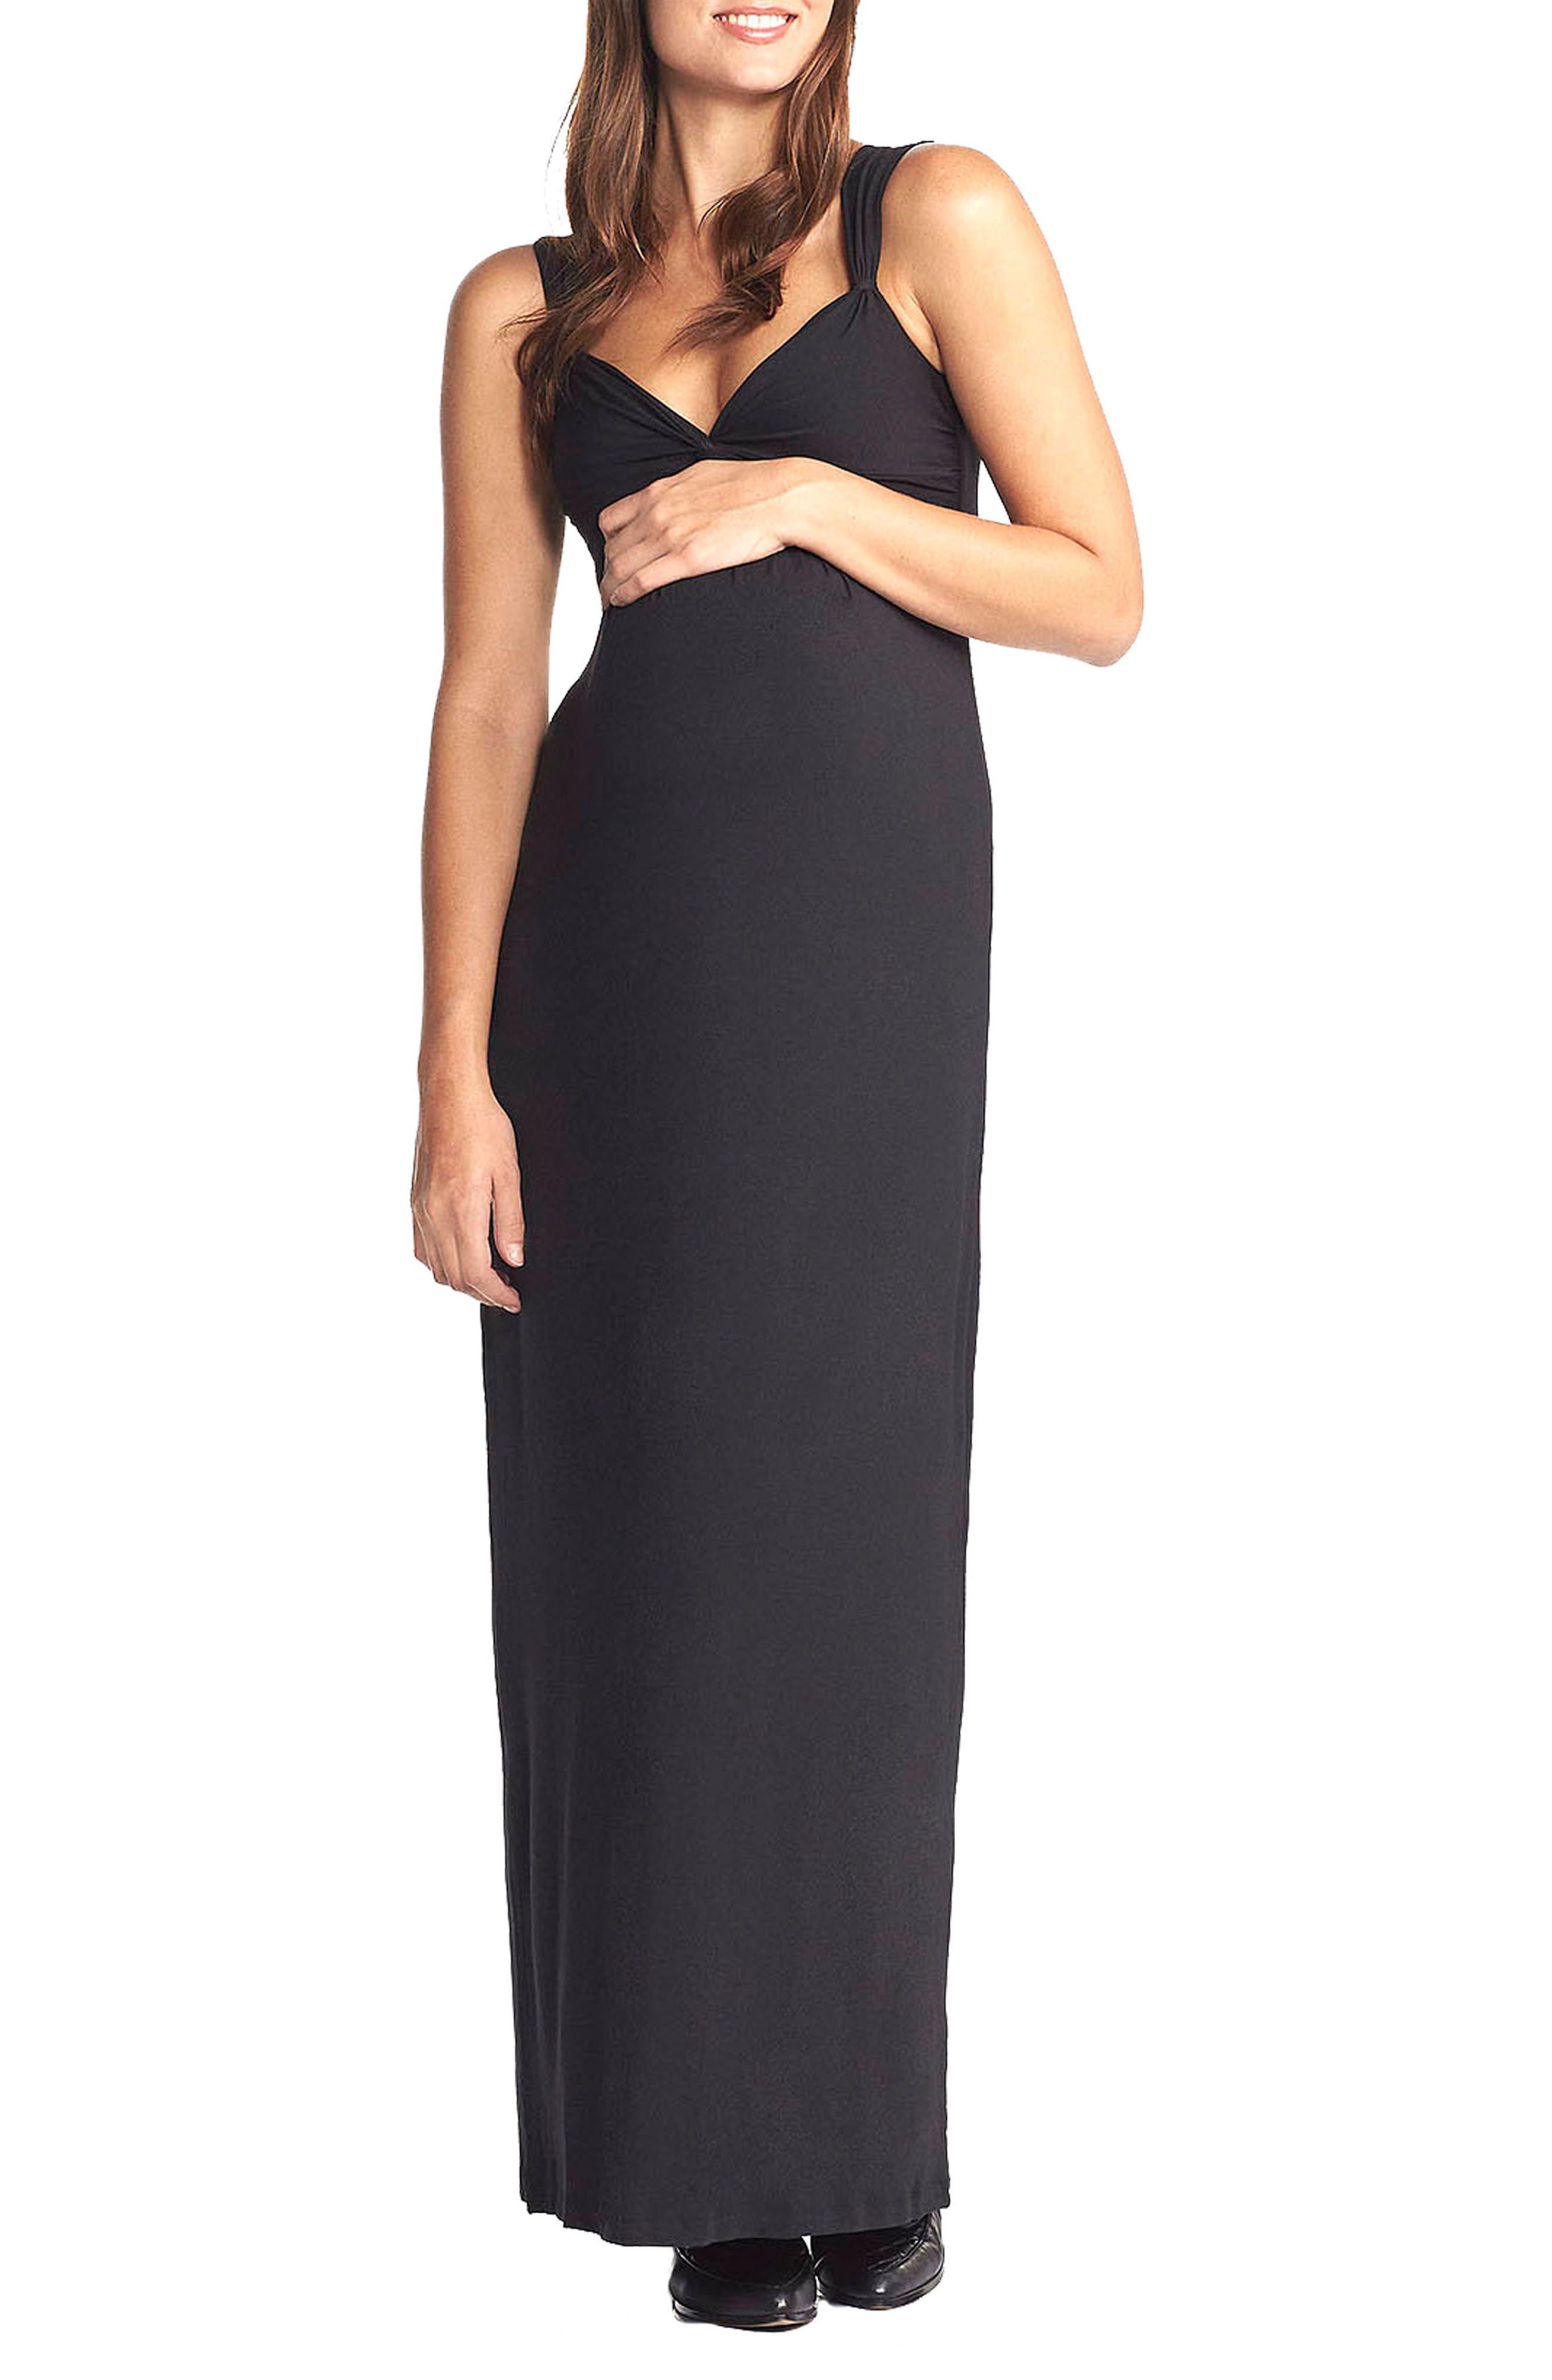 TART MATERNITY, 'Callie' Jersey Maxi Maternity Dress, Main thumbnail 1, color, BLACK